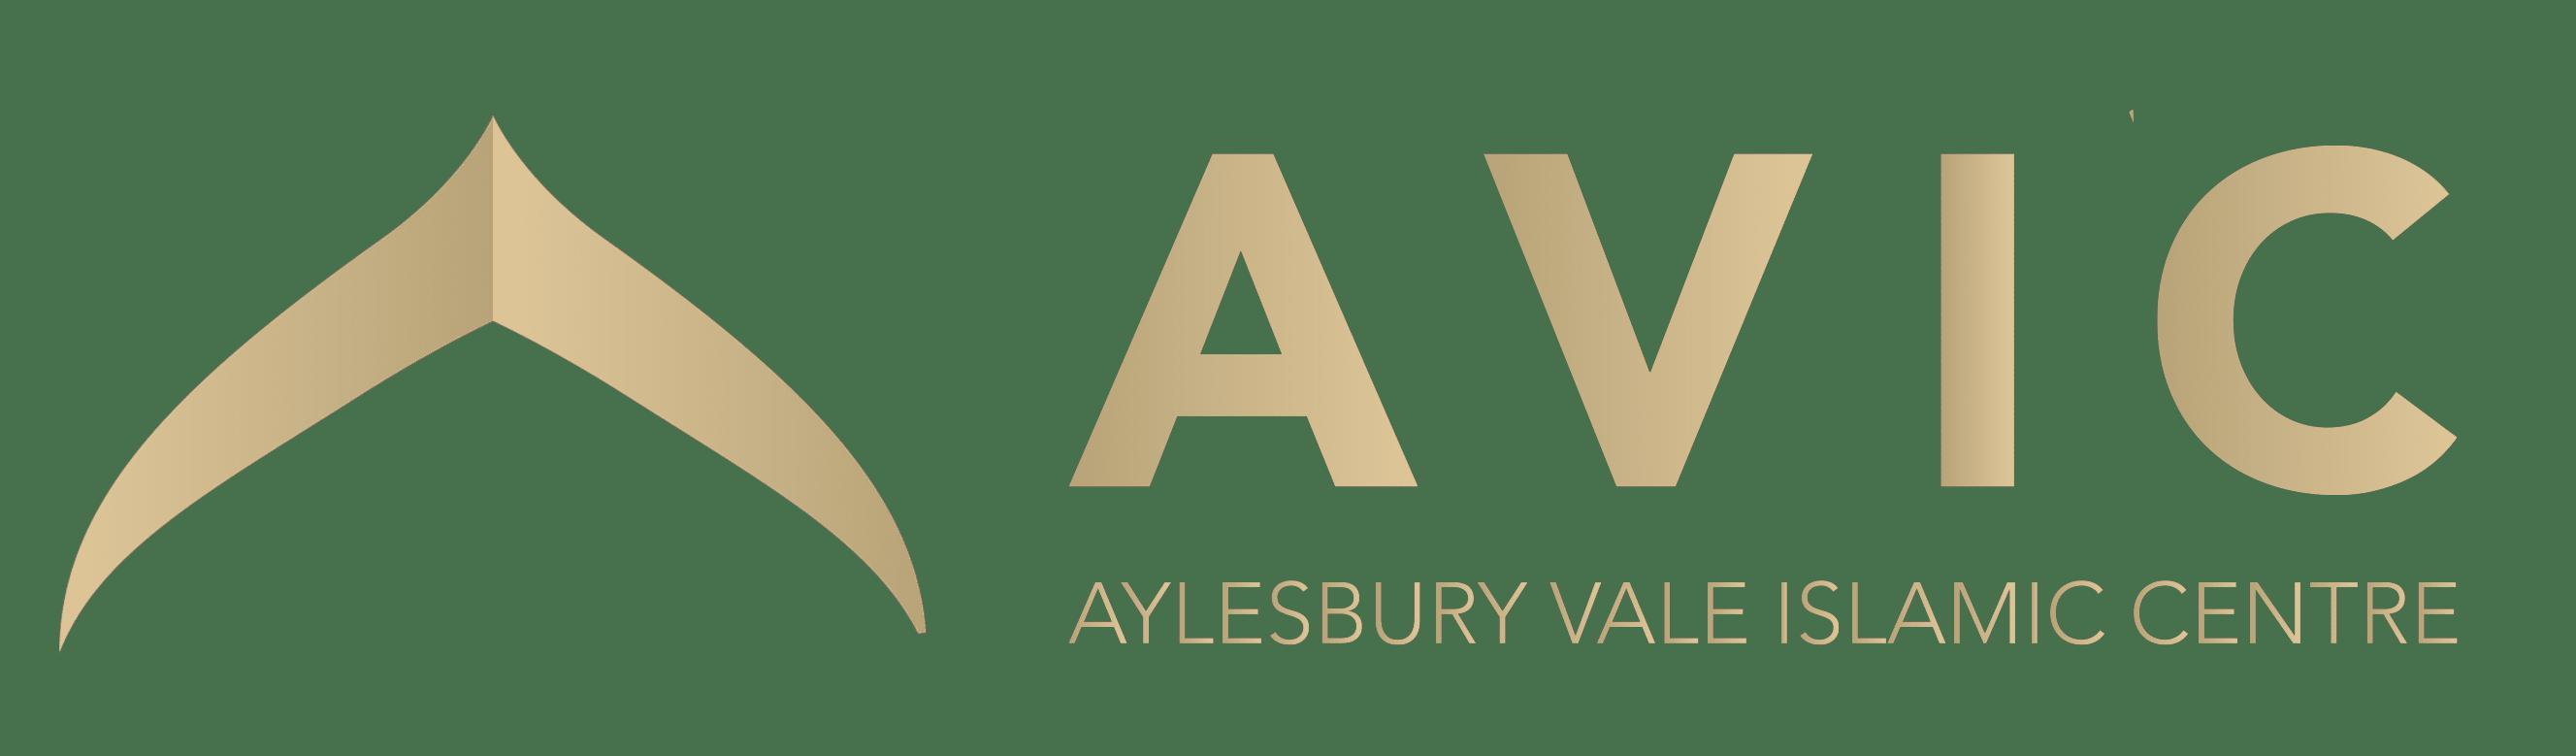 Aylesbury Vale Islamic Centre